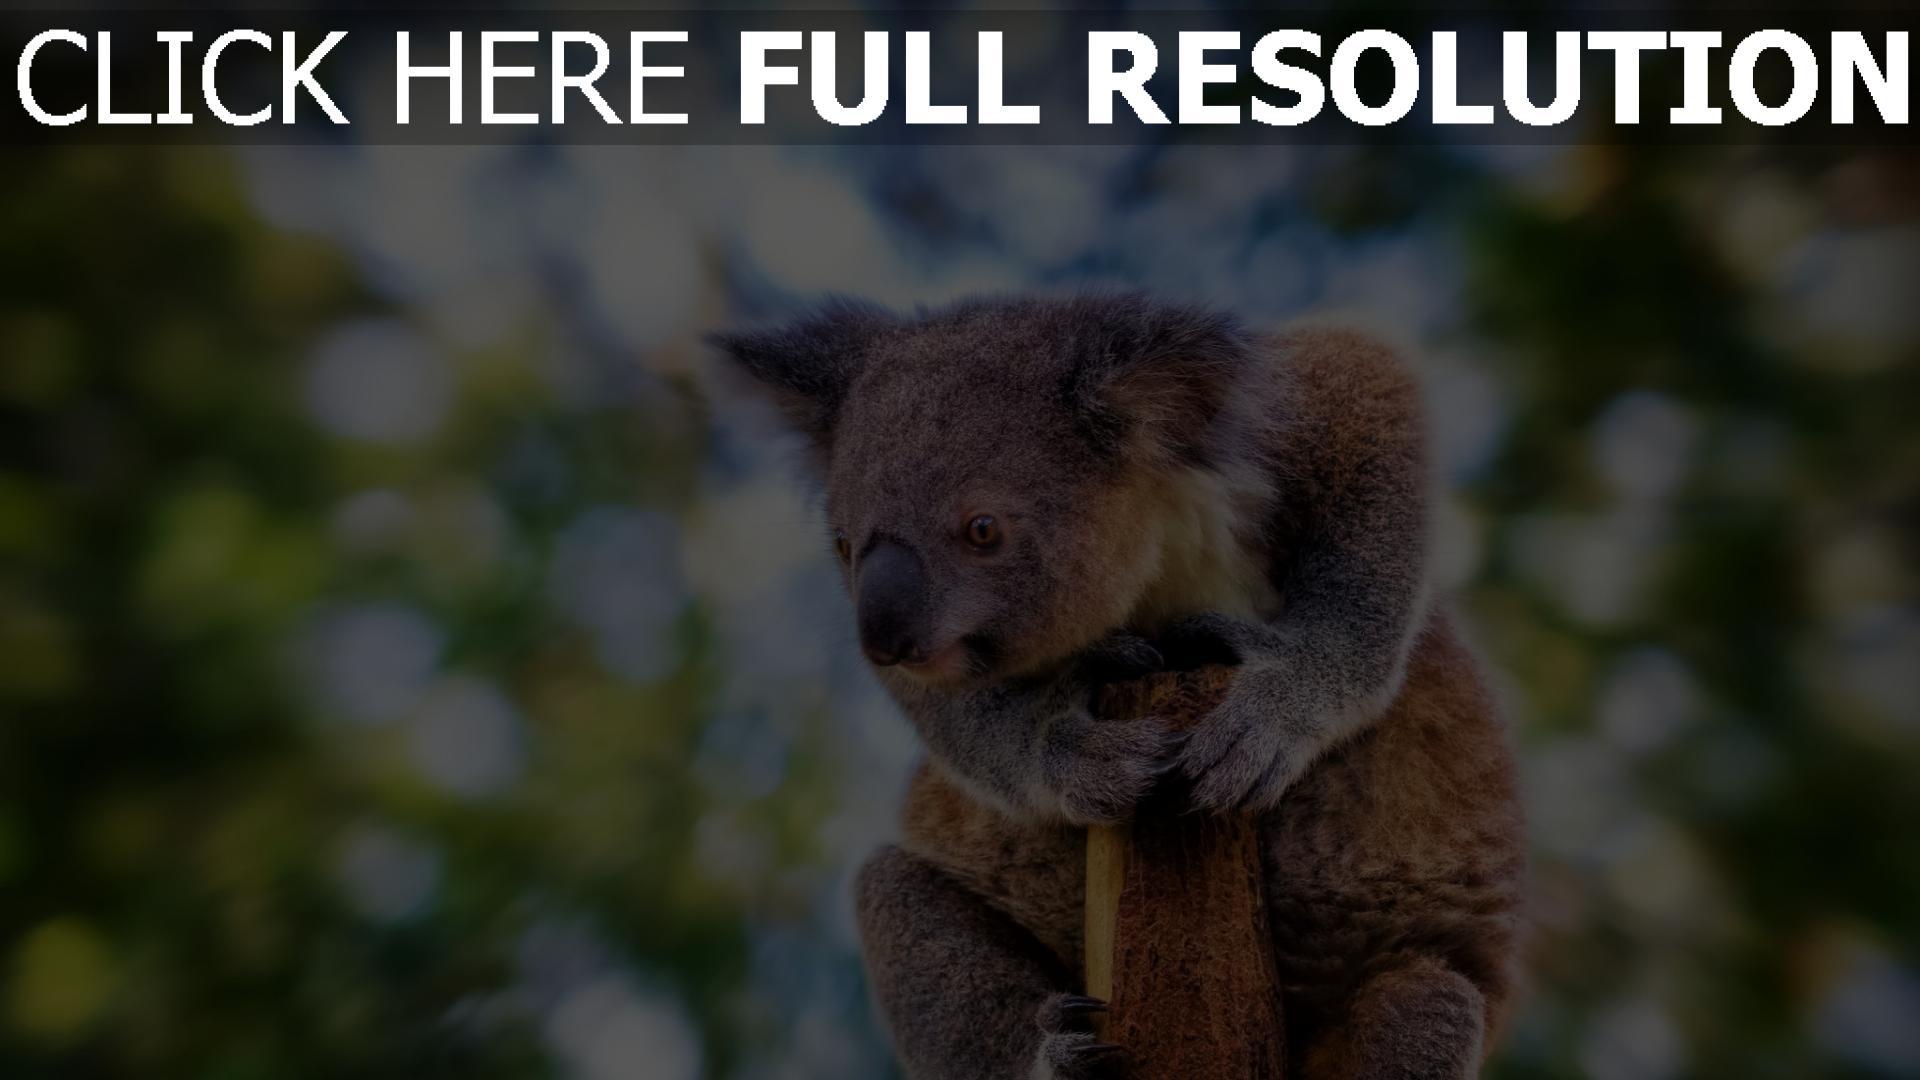 hd hintergrundbilder baum verschwimmen tier koala sitzen 1920x1080